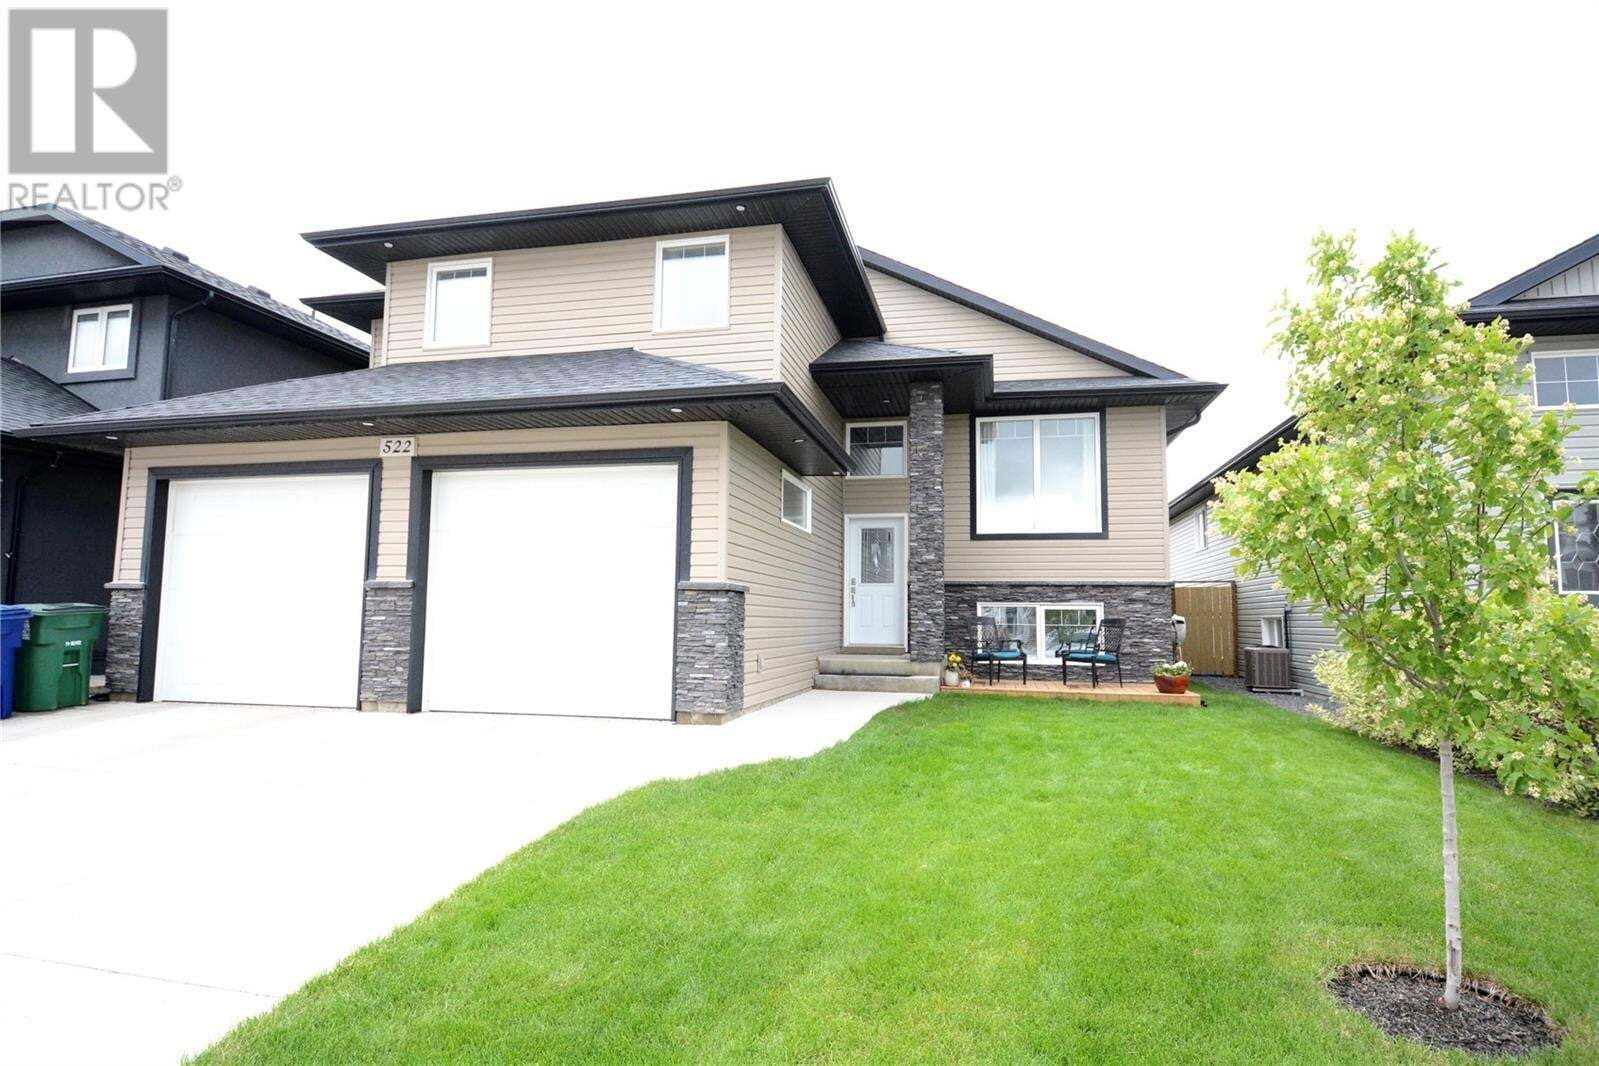 House for sale at 522 Evergreen Blvd Saskatoon Saskatchewan - MLS: SK813449